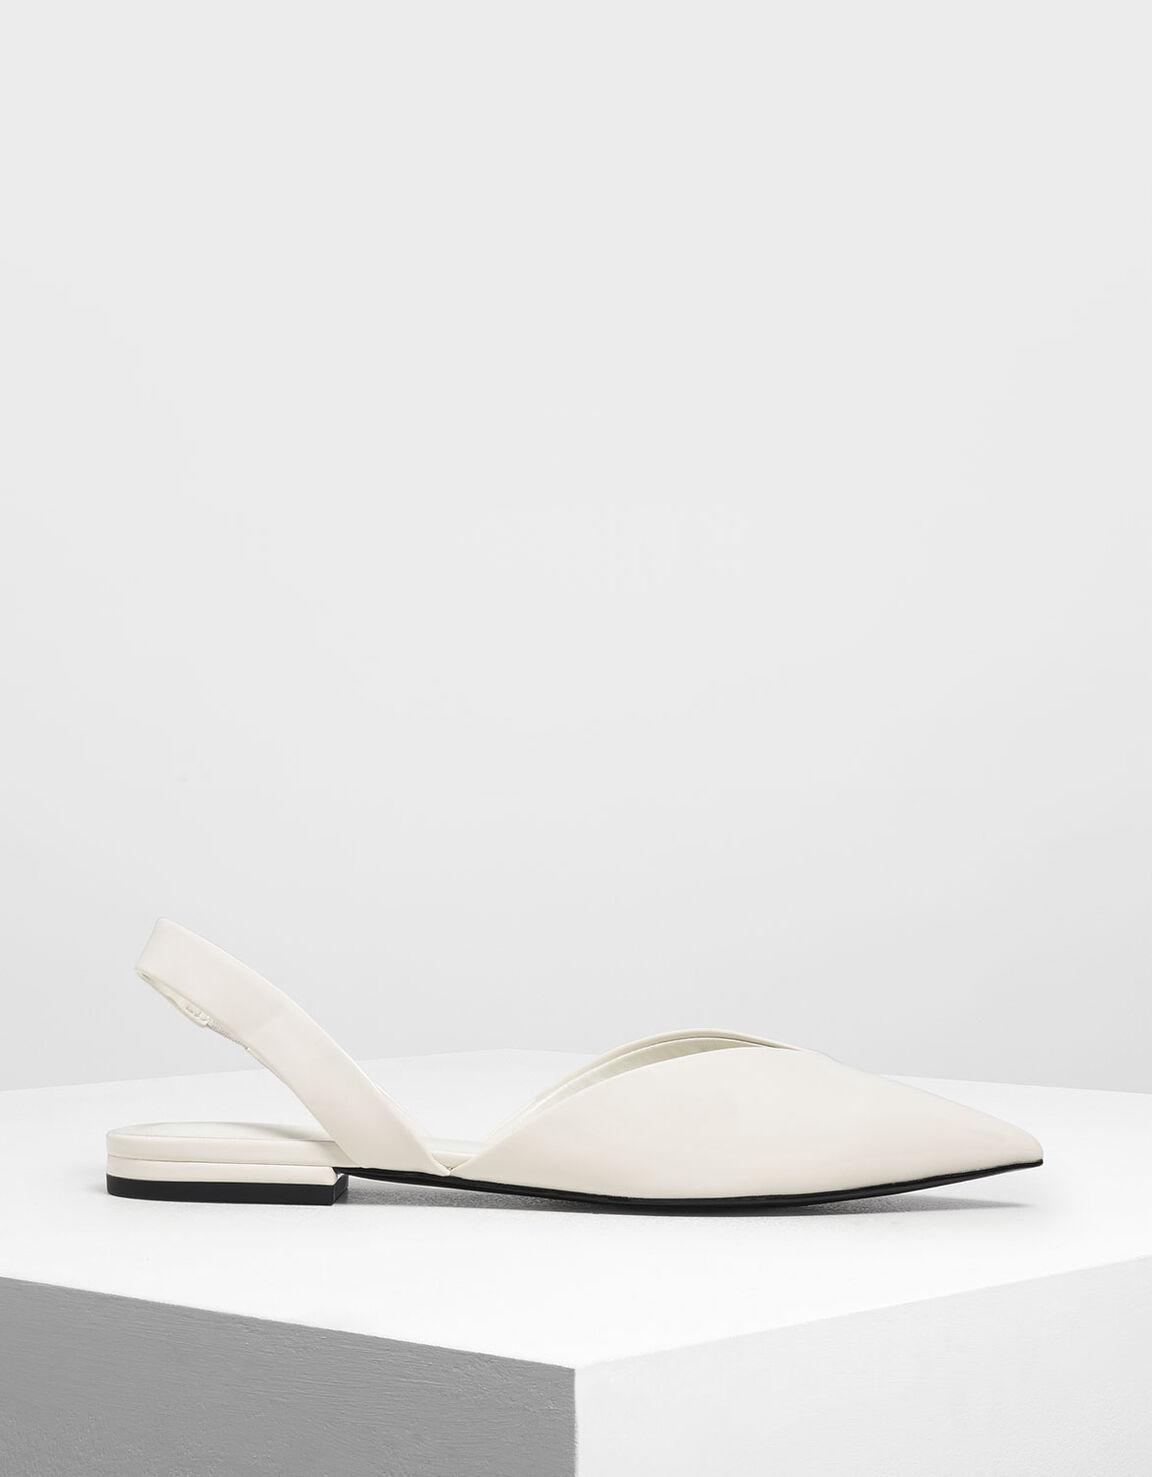 CHARLES & KEITH 鞋款低至34折優惠!:第17張圖片